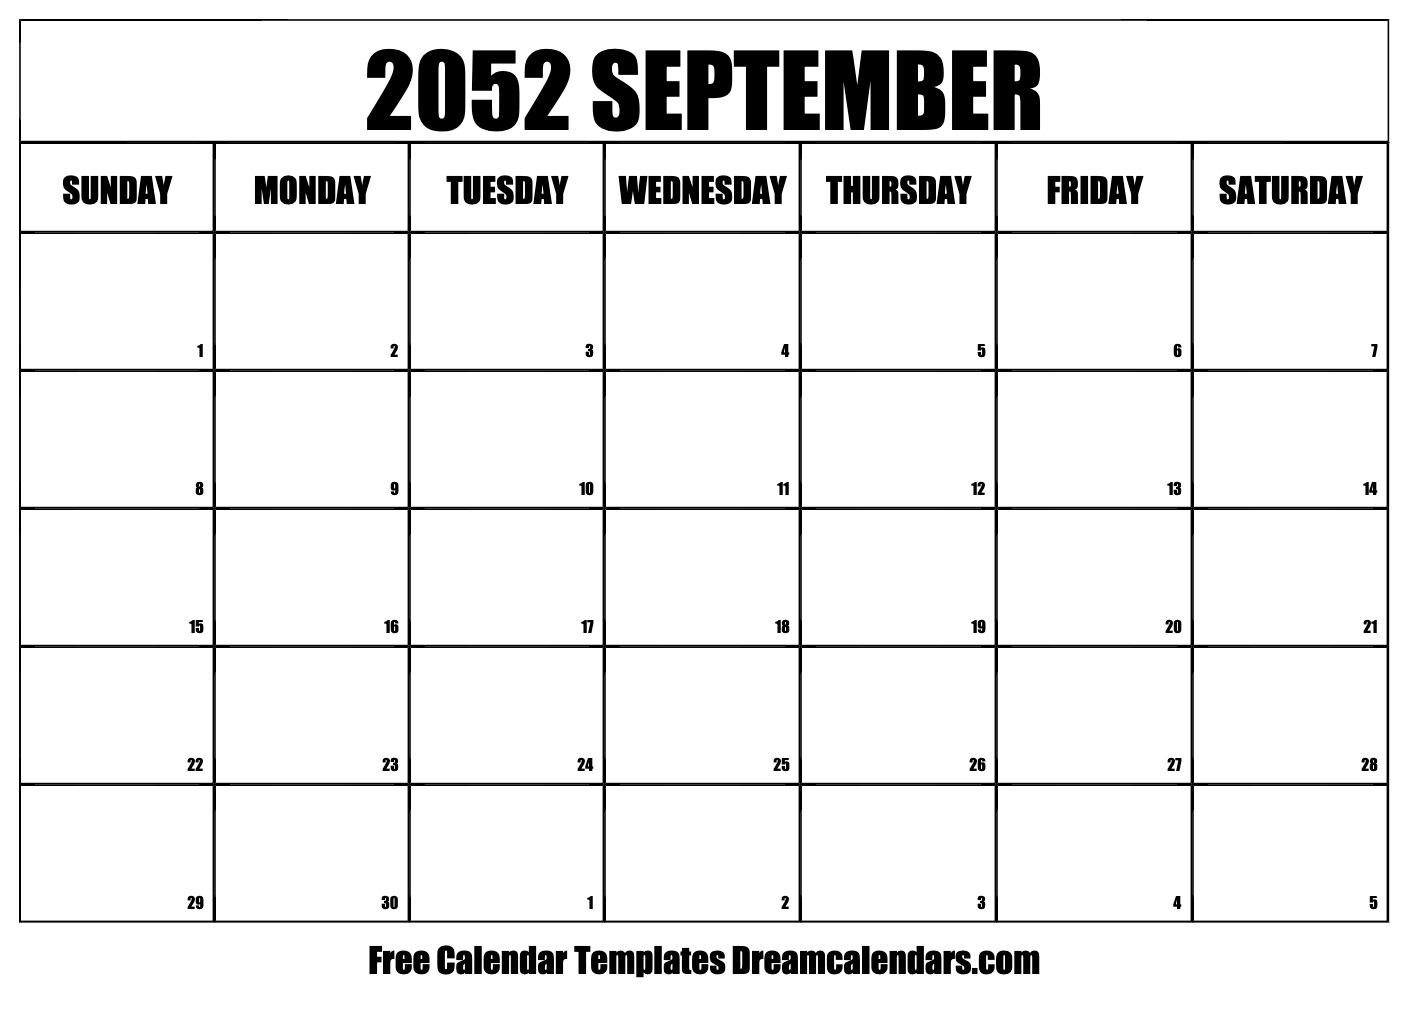 Free Blank September 2052 Printable Calendar